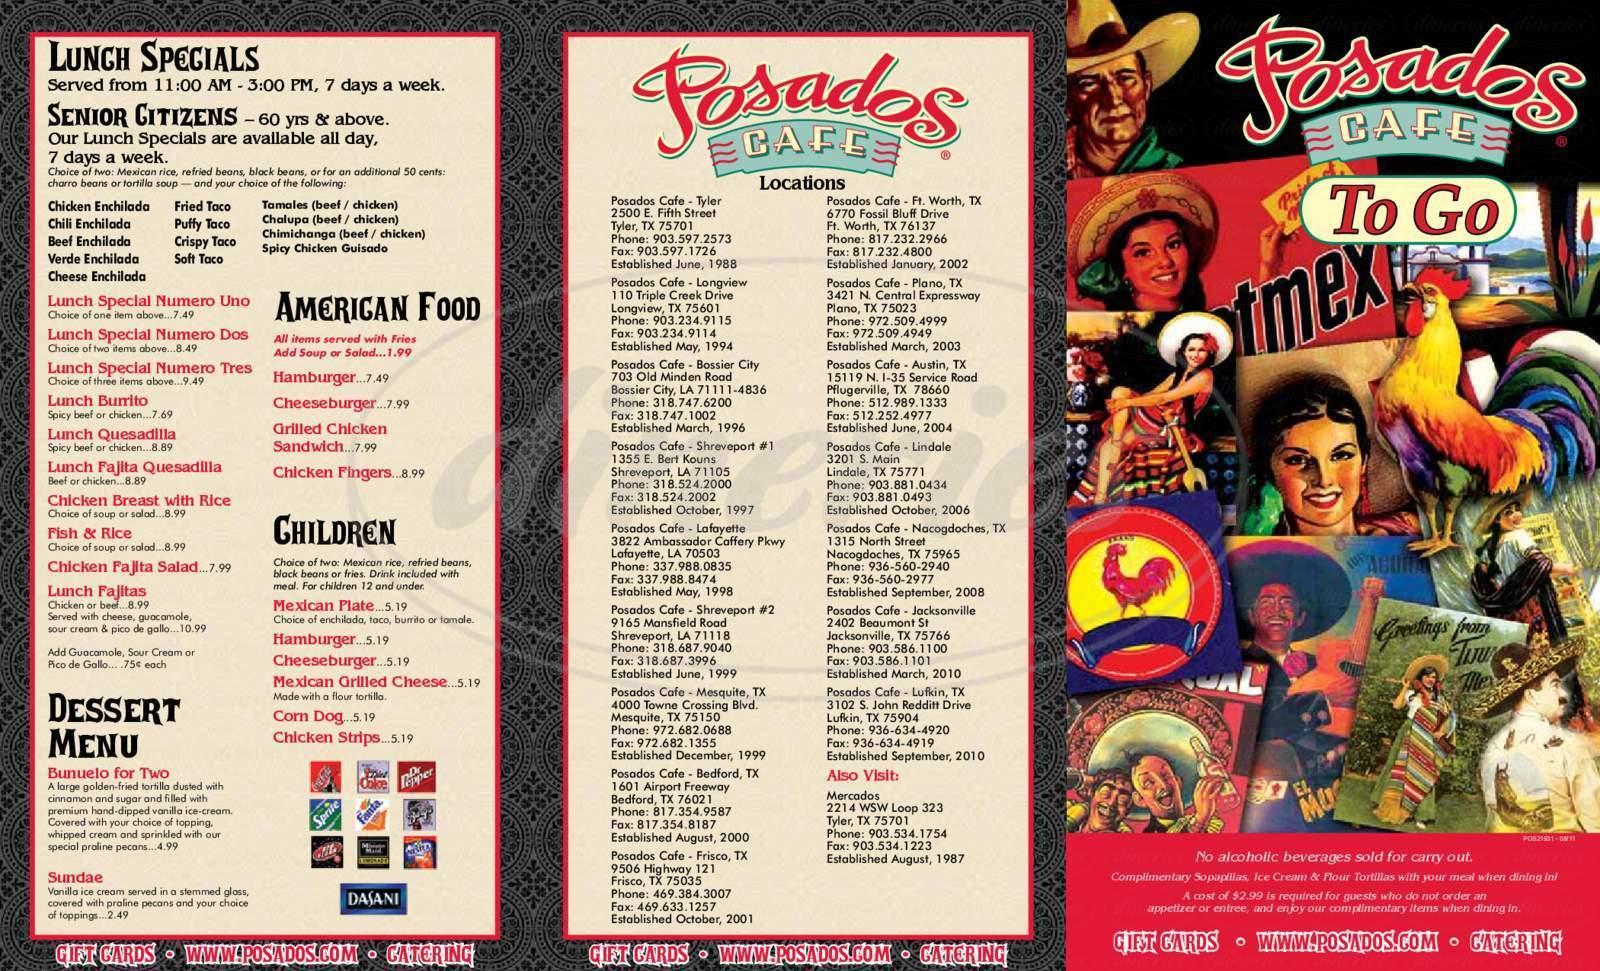 menu for Posados